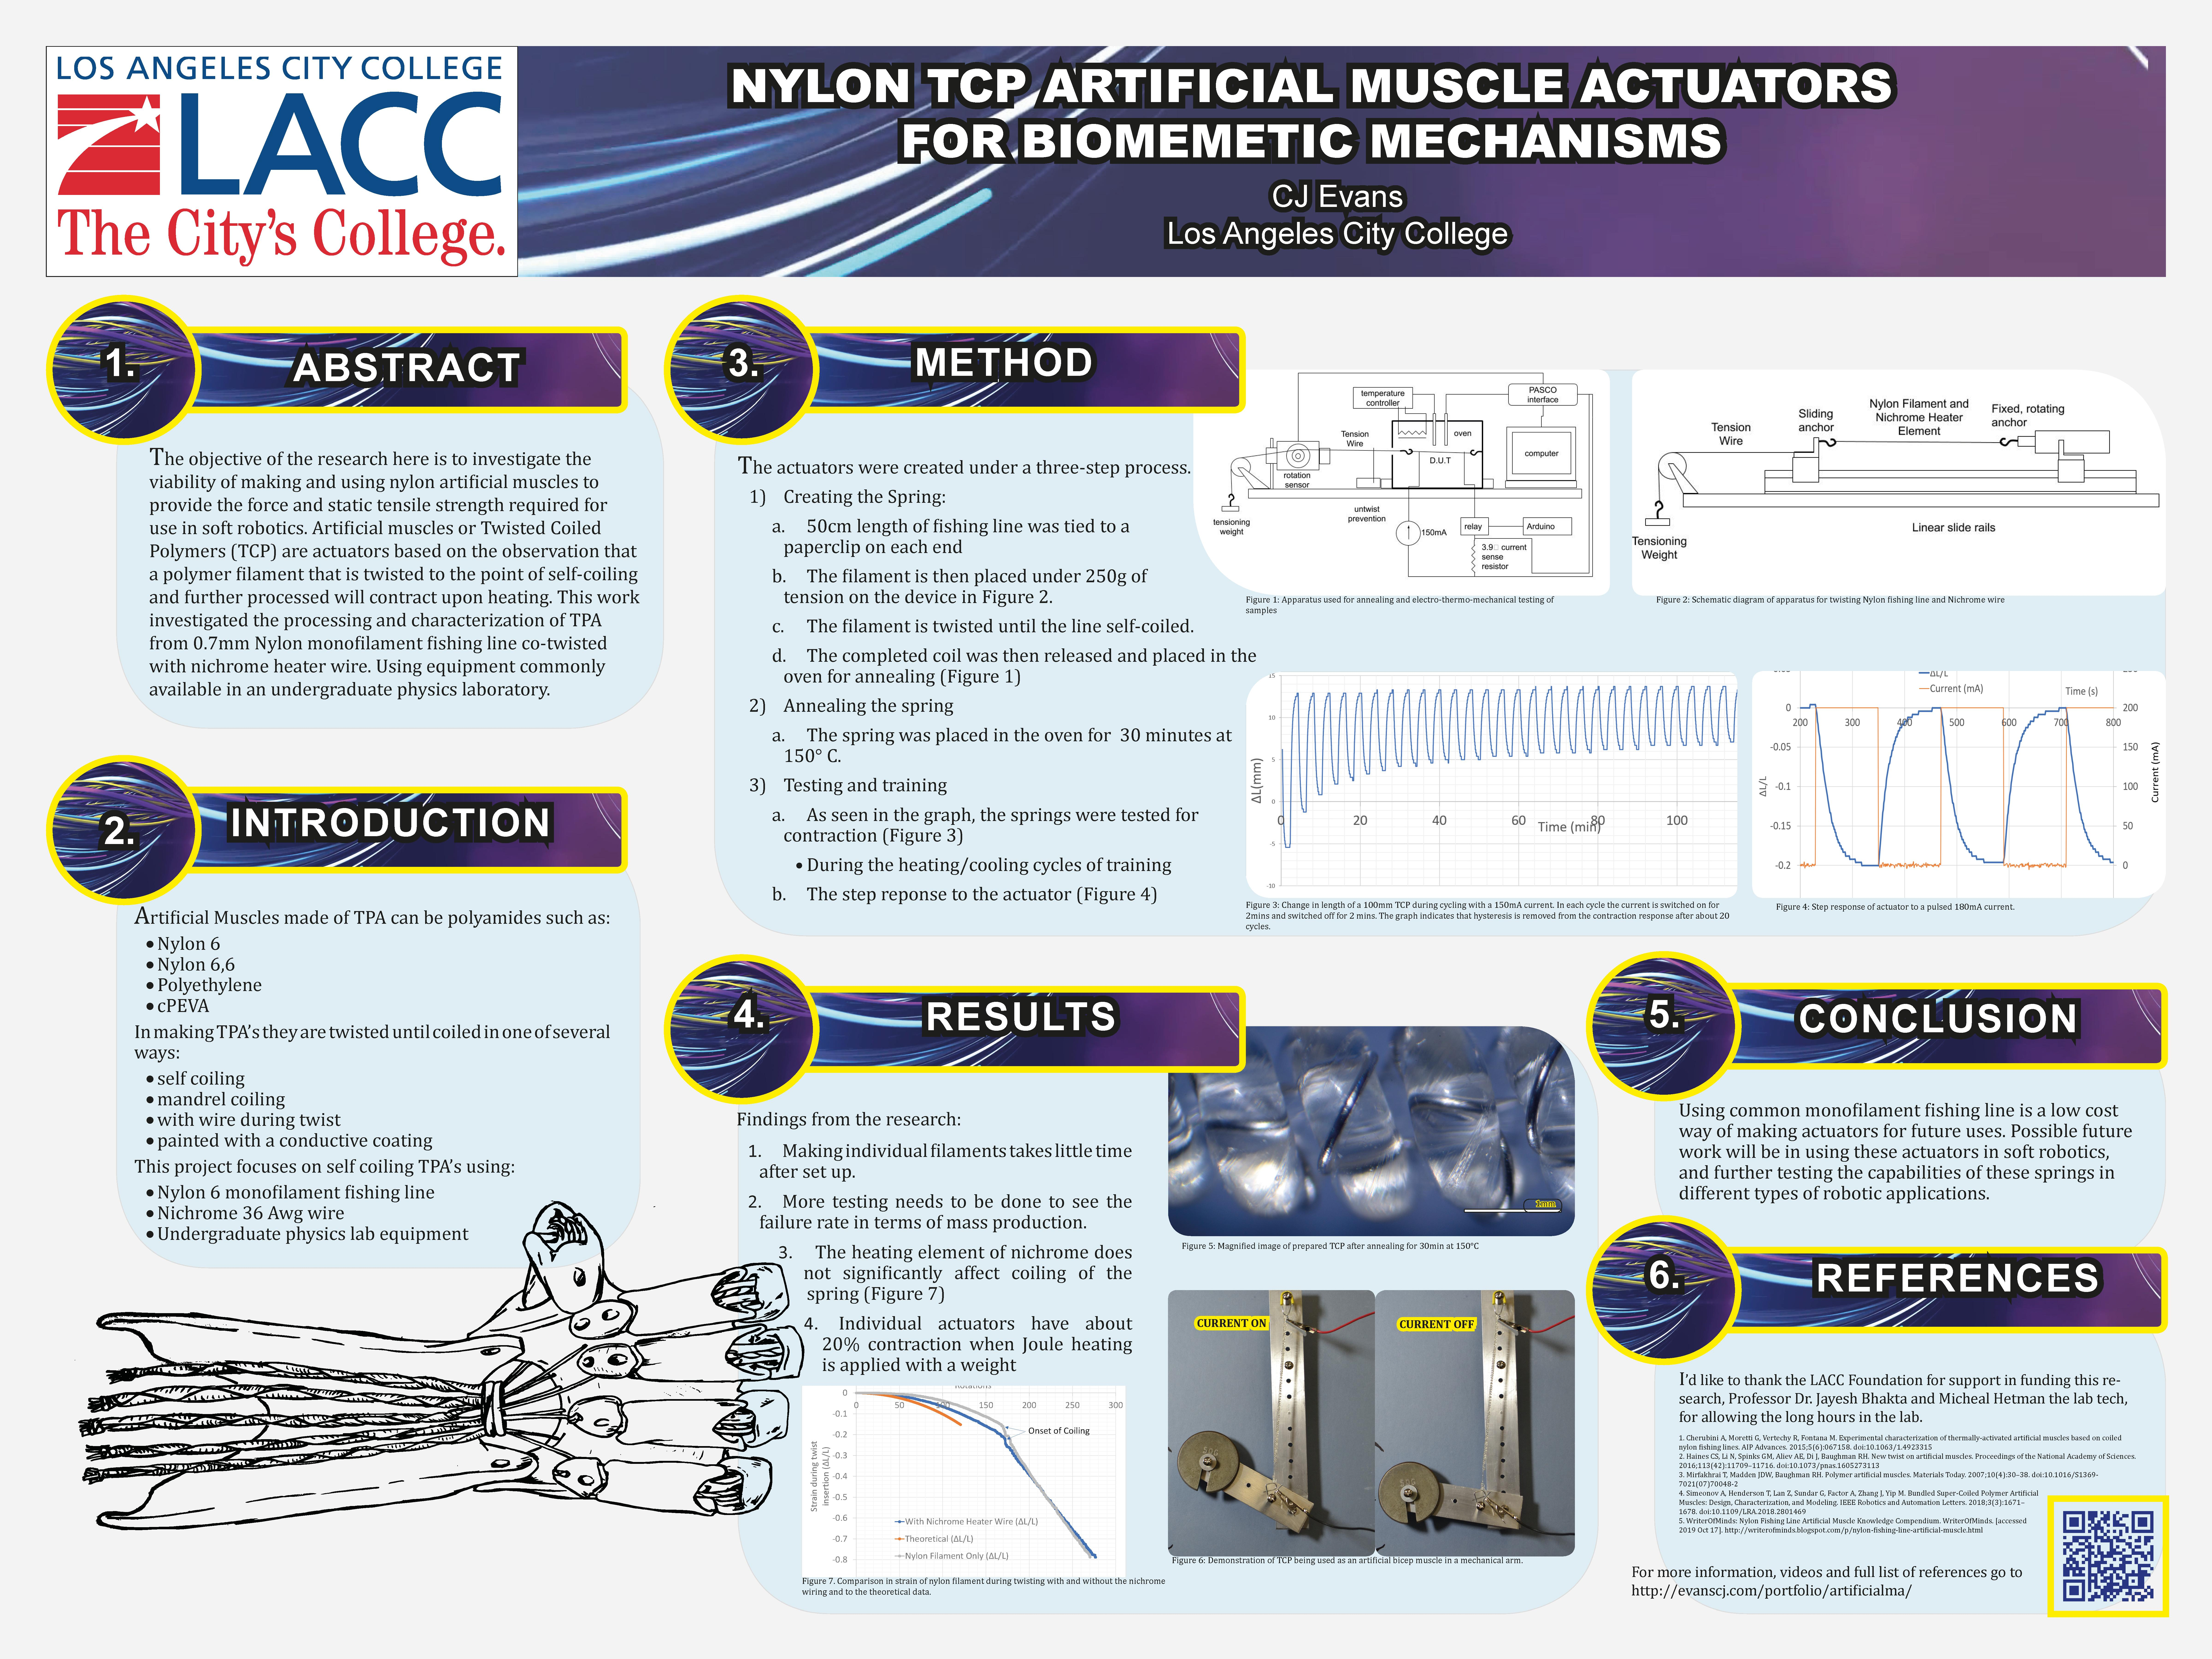 Nylon TCP artificial muscle actuators